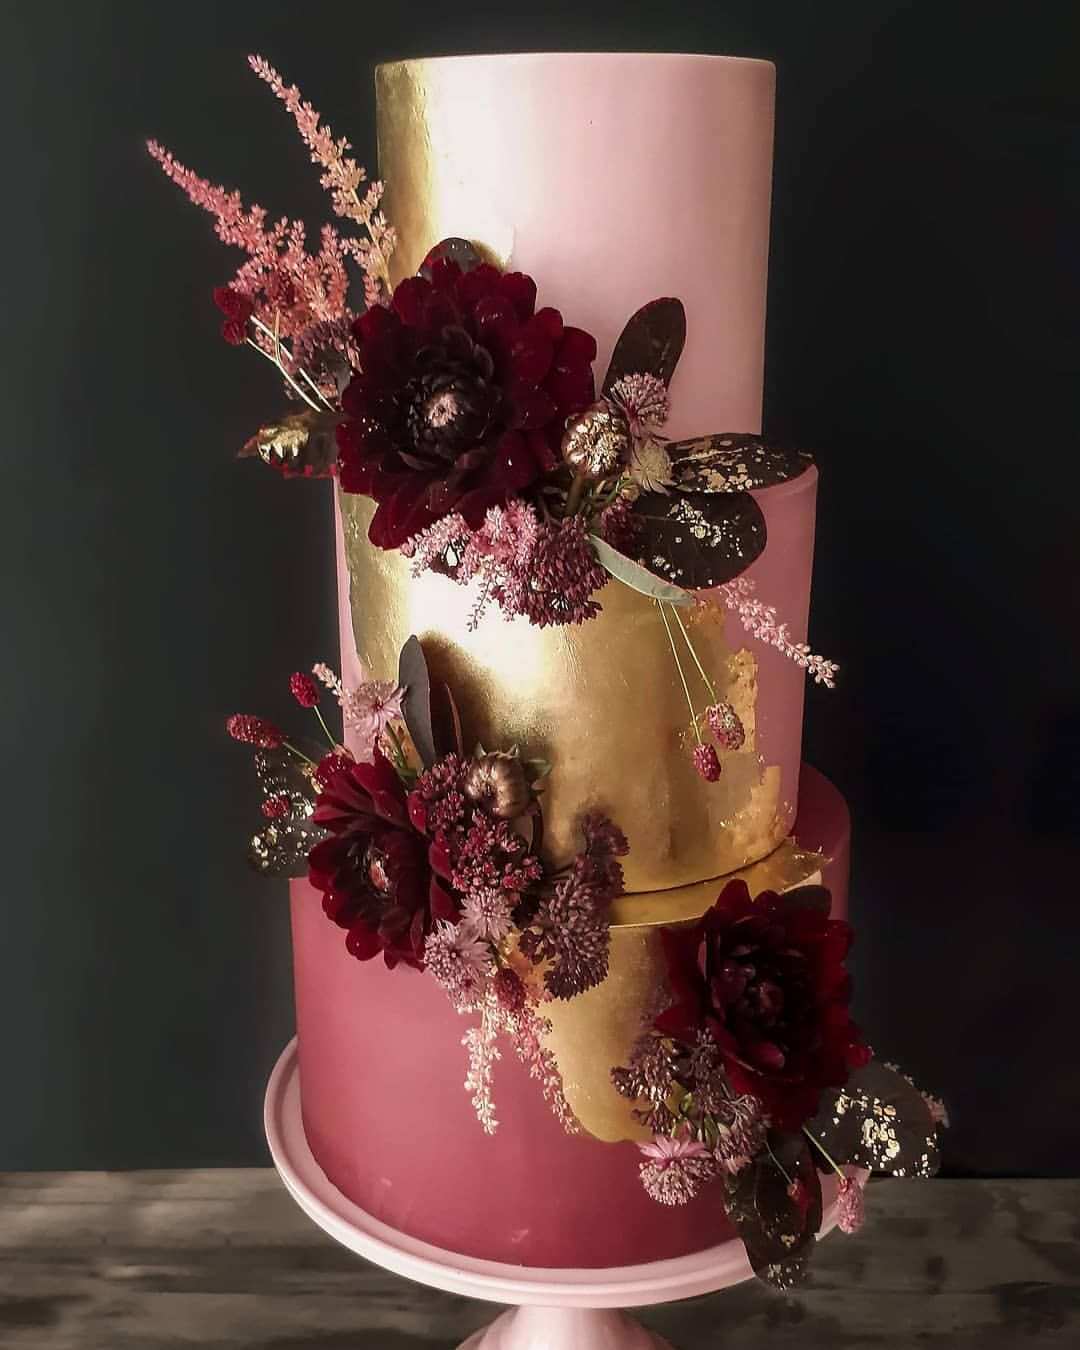 Like Butter Hochzeitstorten Auf Instagram I Love It I Love It I Love It Meine Absolute Lieblings In 2020 Wedding Cake Inspiration Pillar Candles Wedding Cakes